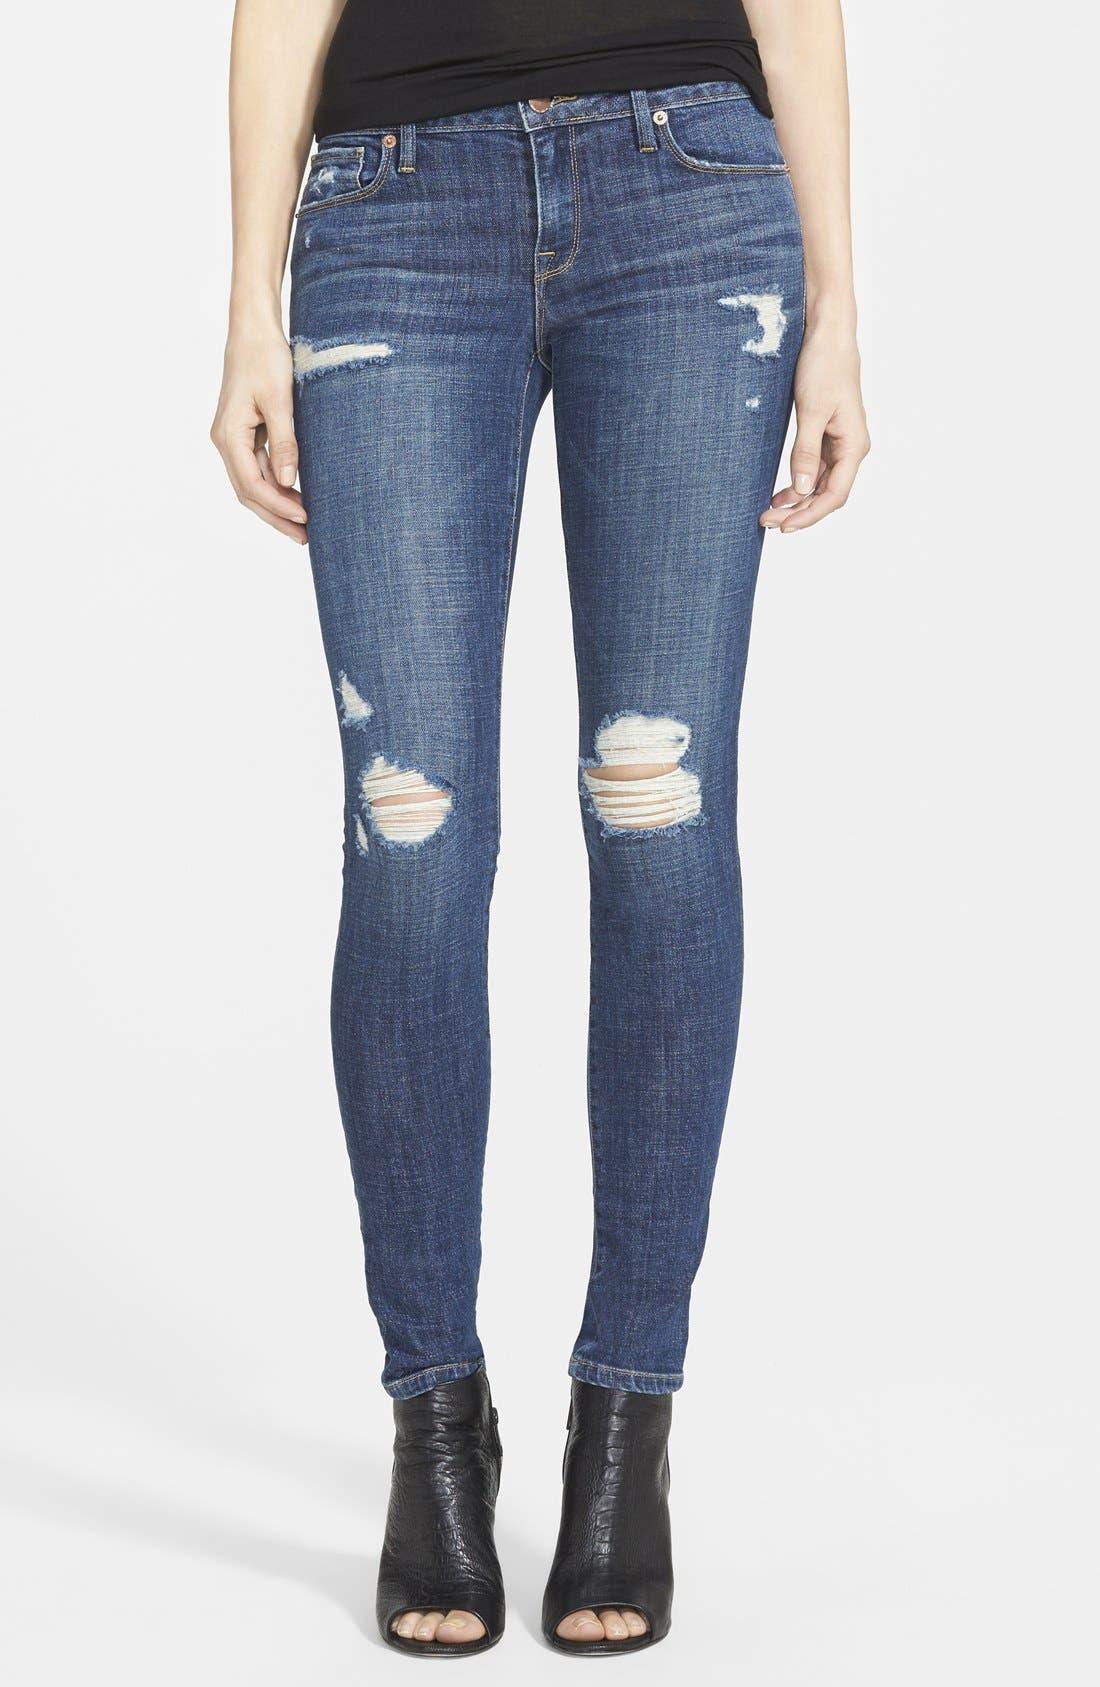 GENETIC, 'Shya' Skinny Jeans, Main thumbnail 1, color, 421